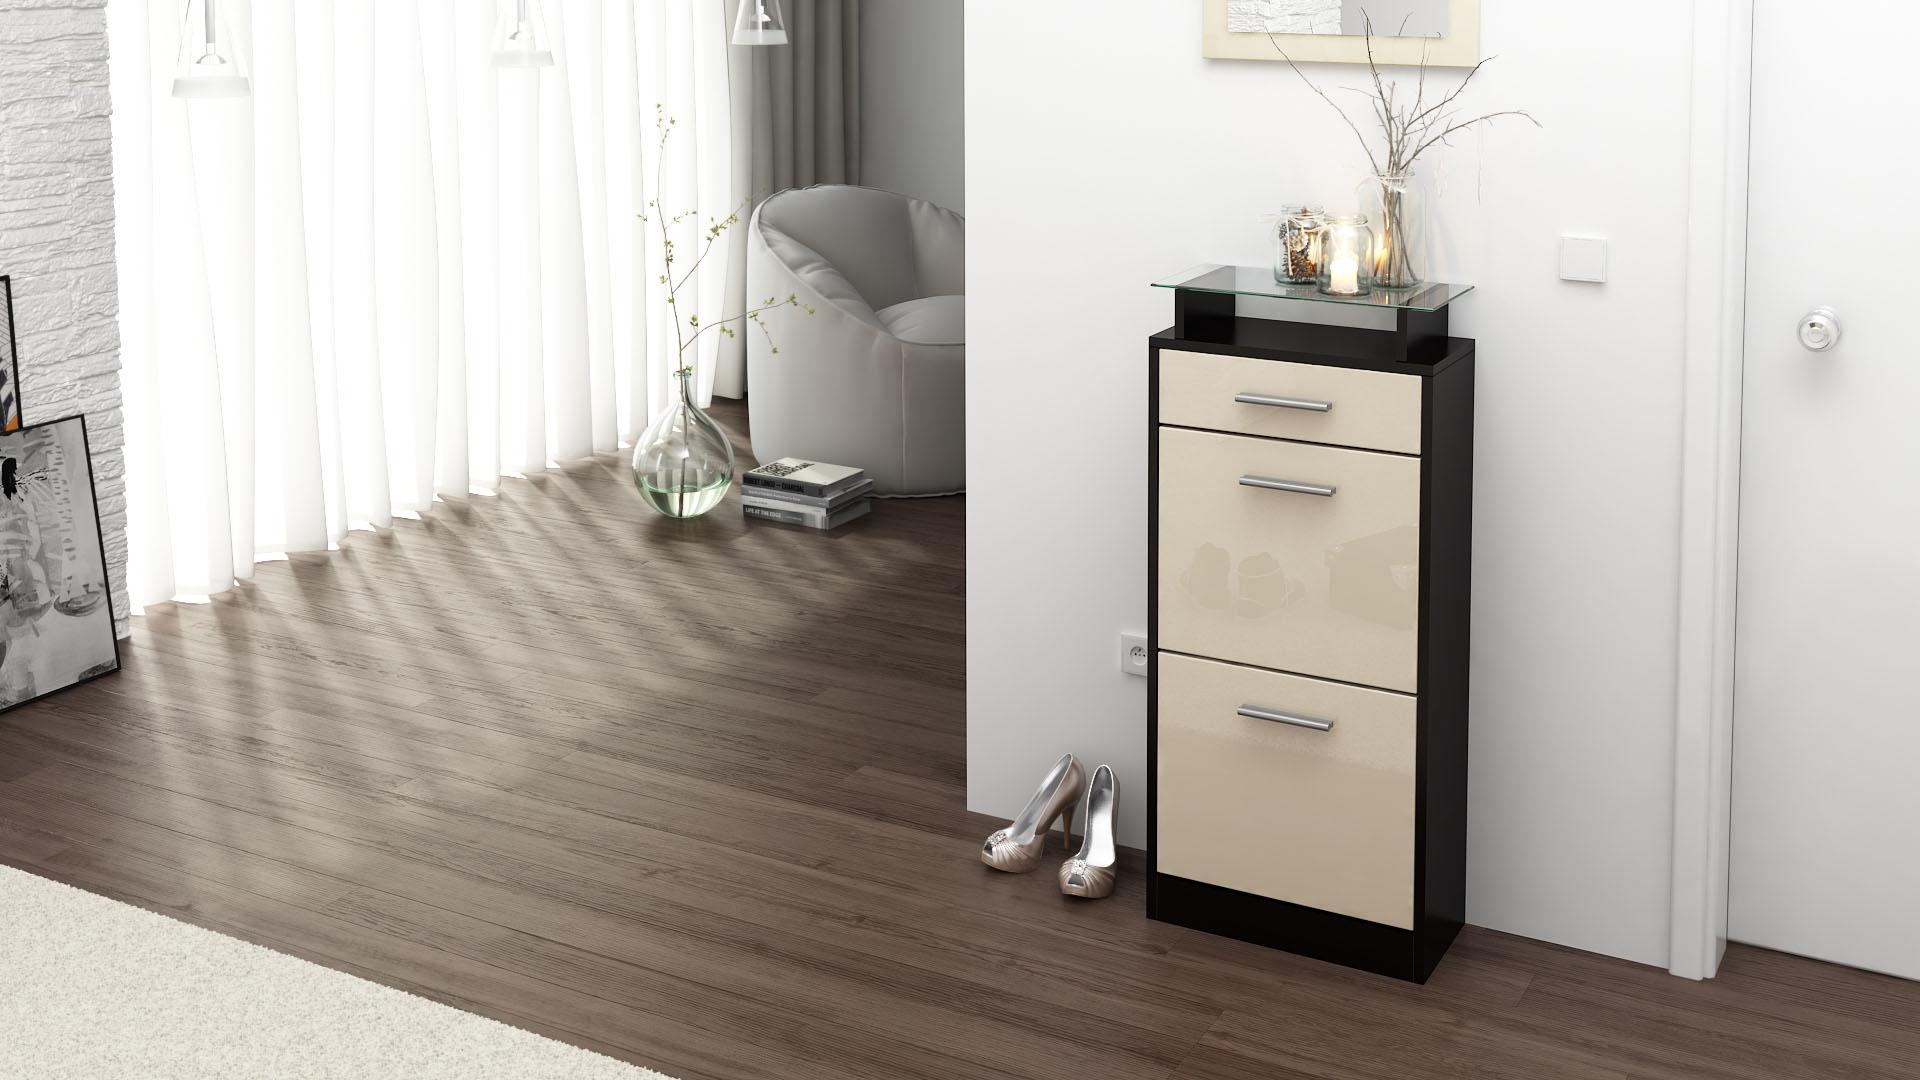 schuhschrank schuhkipper schuh loret v2 in schwarz hochglanz matt naturt ne. Black Bedroom Furniture Sets. Home Design Ideas